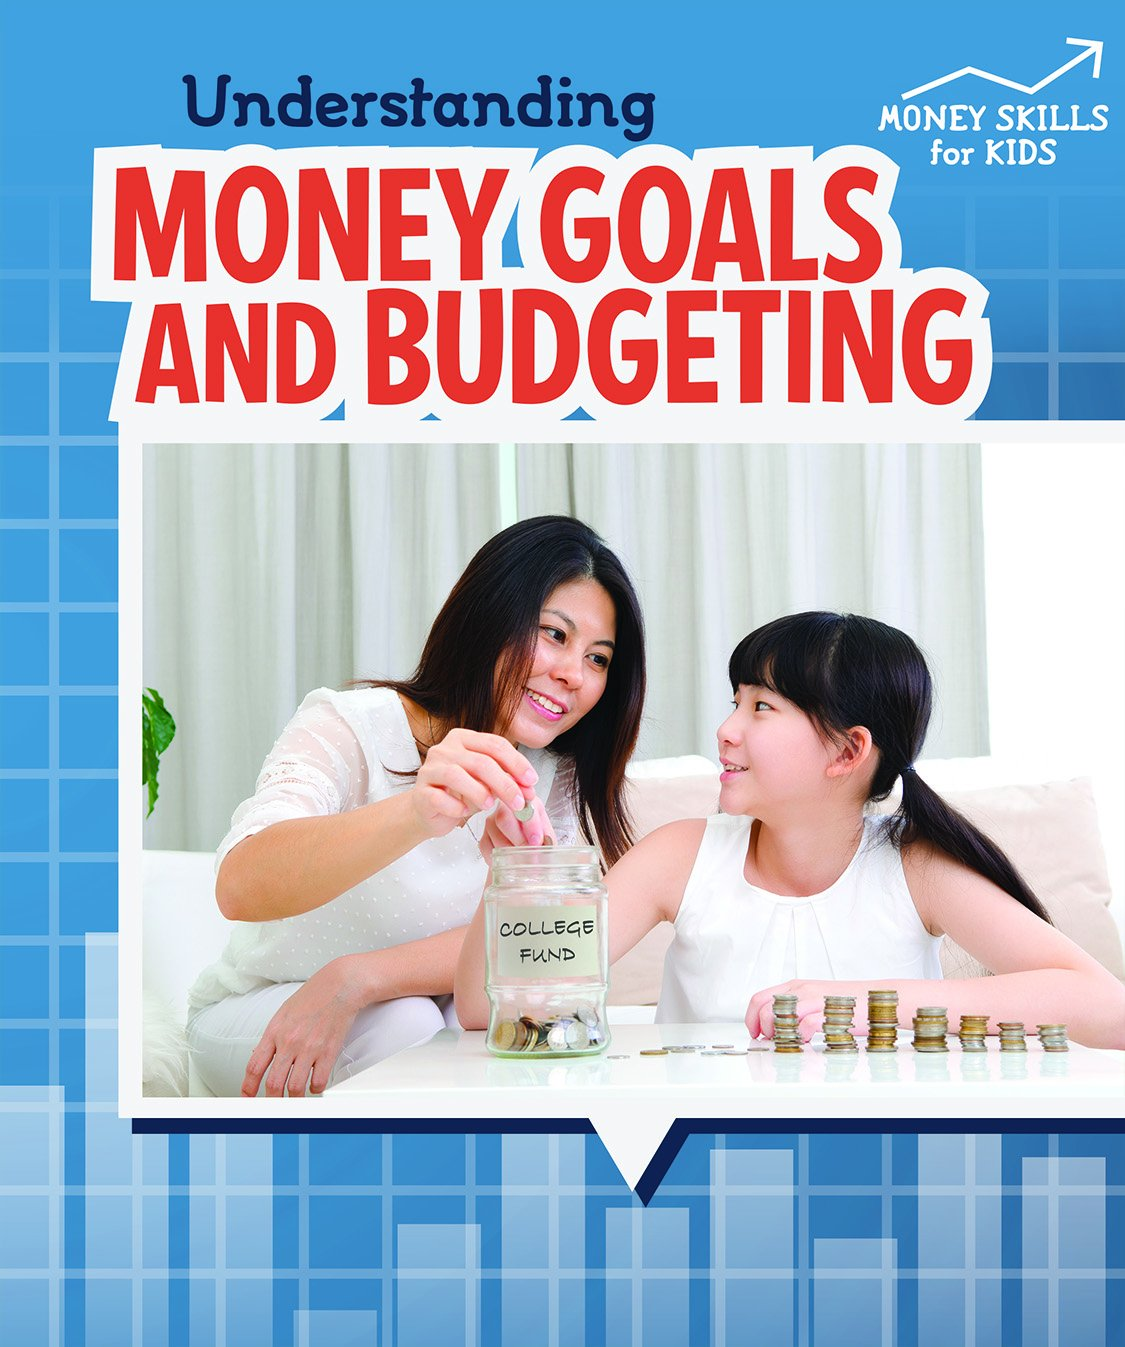 Understanding Money Goals and Budgeting (Money Skills for Kids)